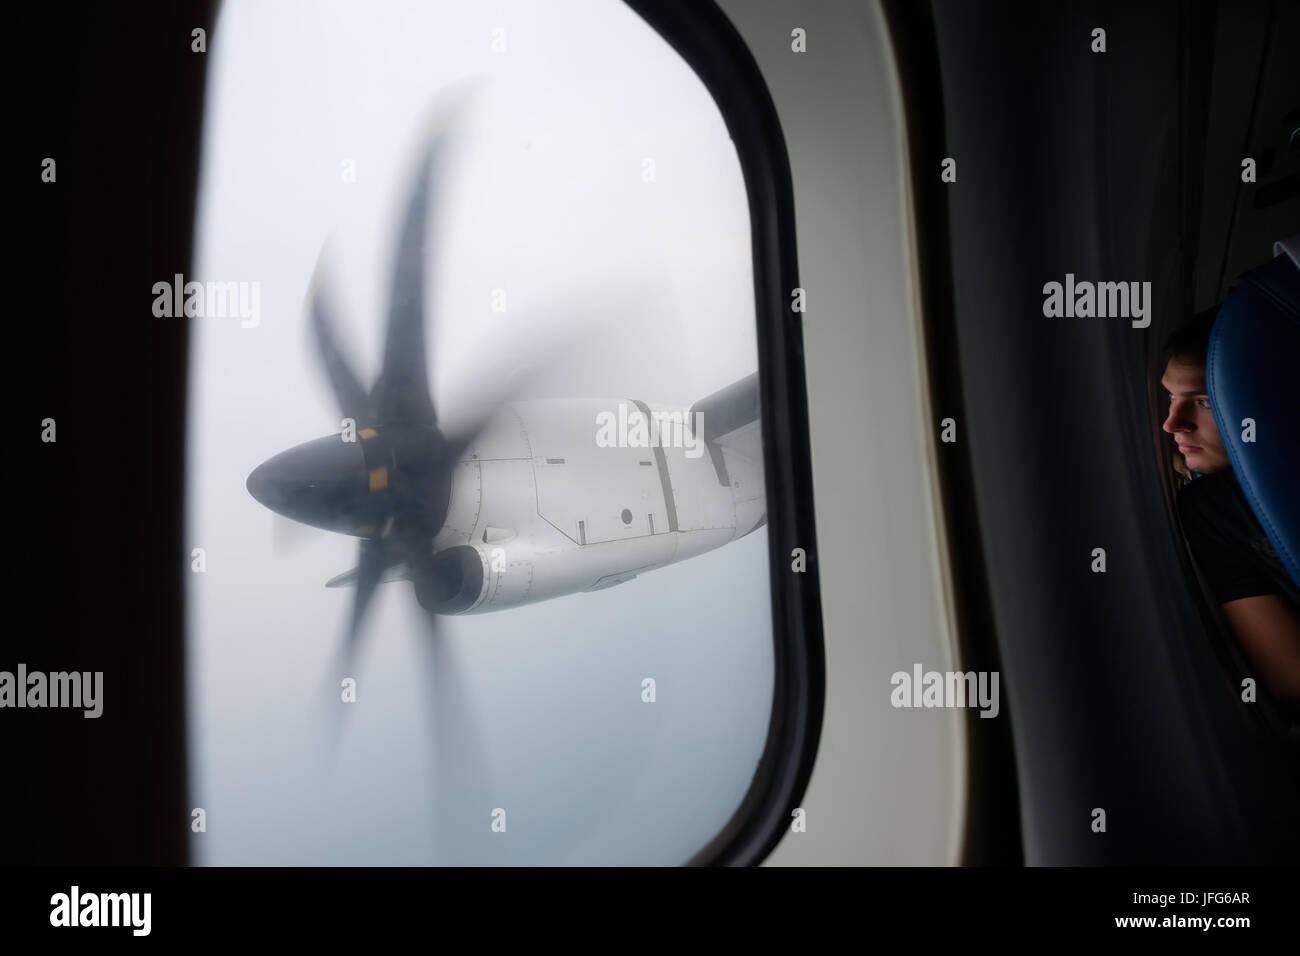 Person Blick aus dem Fenster eines Flugzeuges am Propeller Motor Stockbild